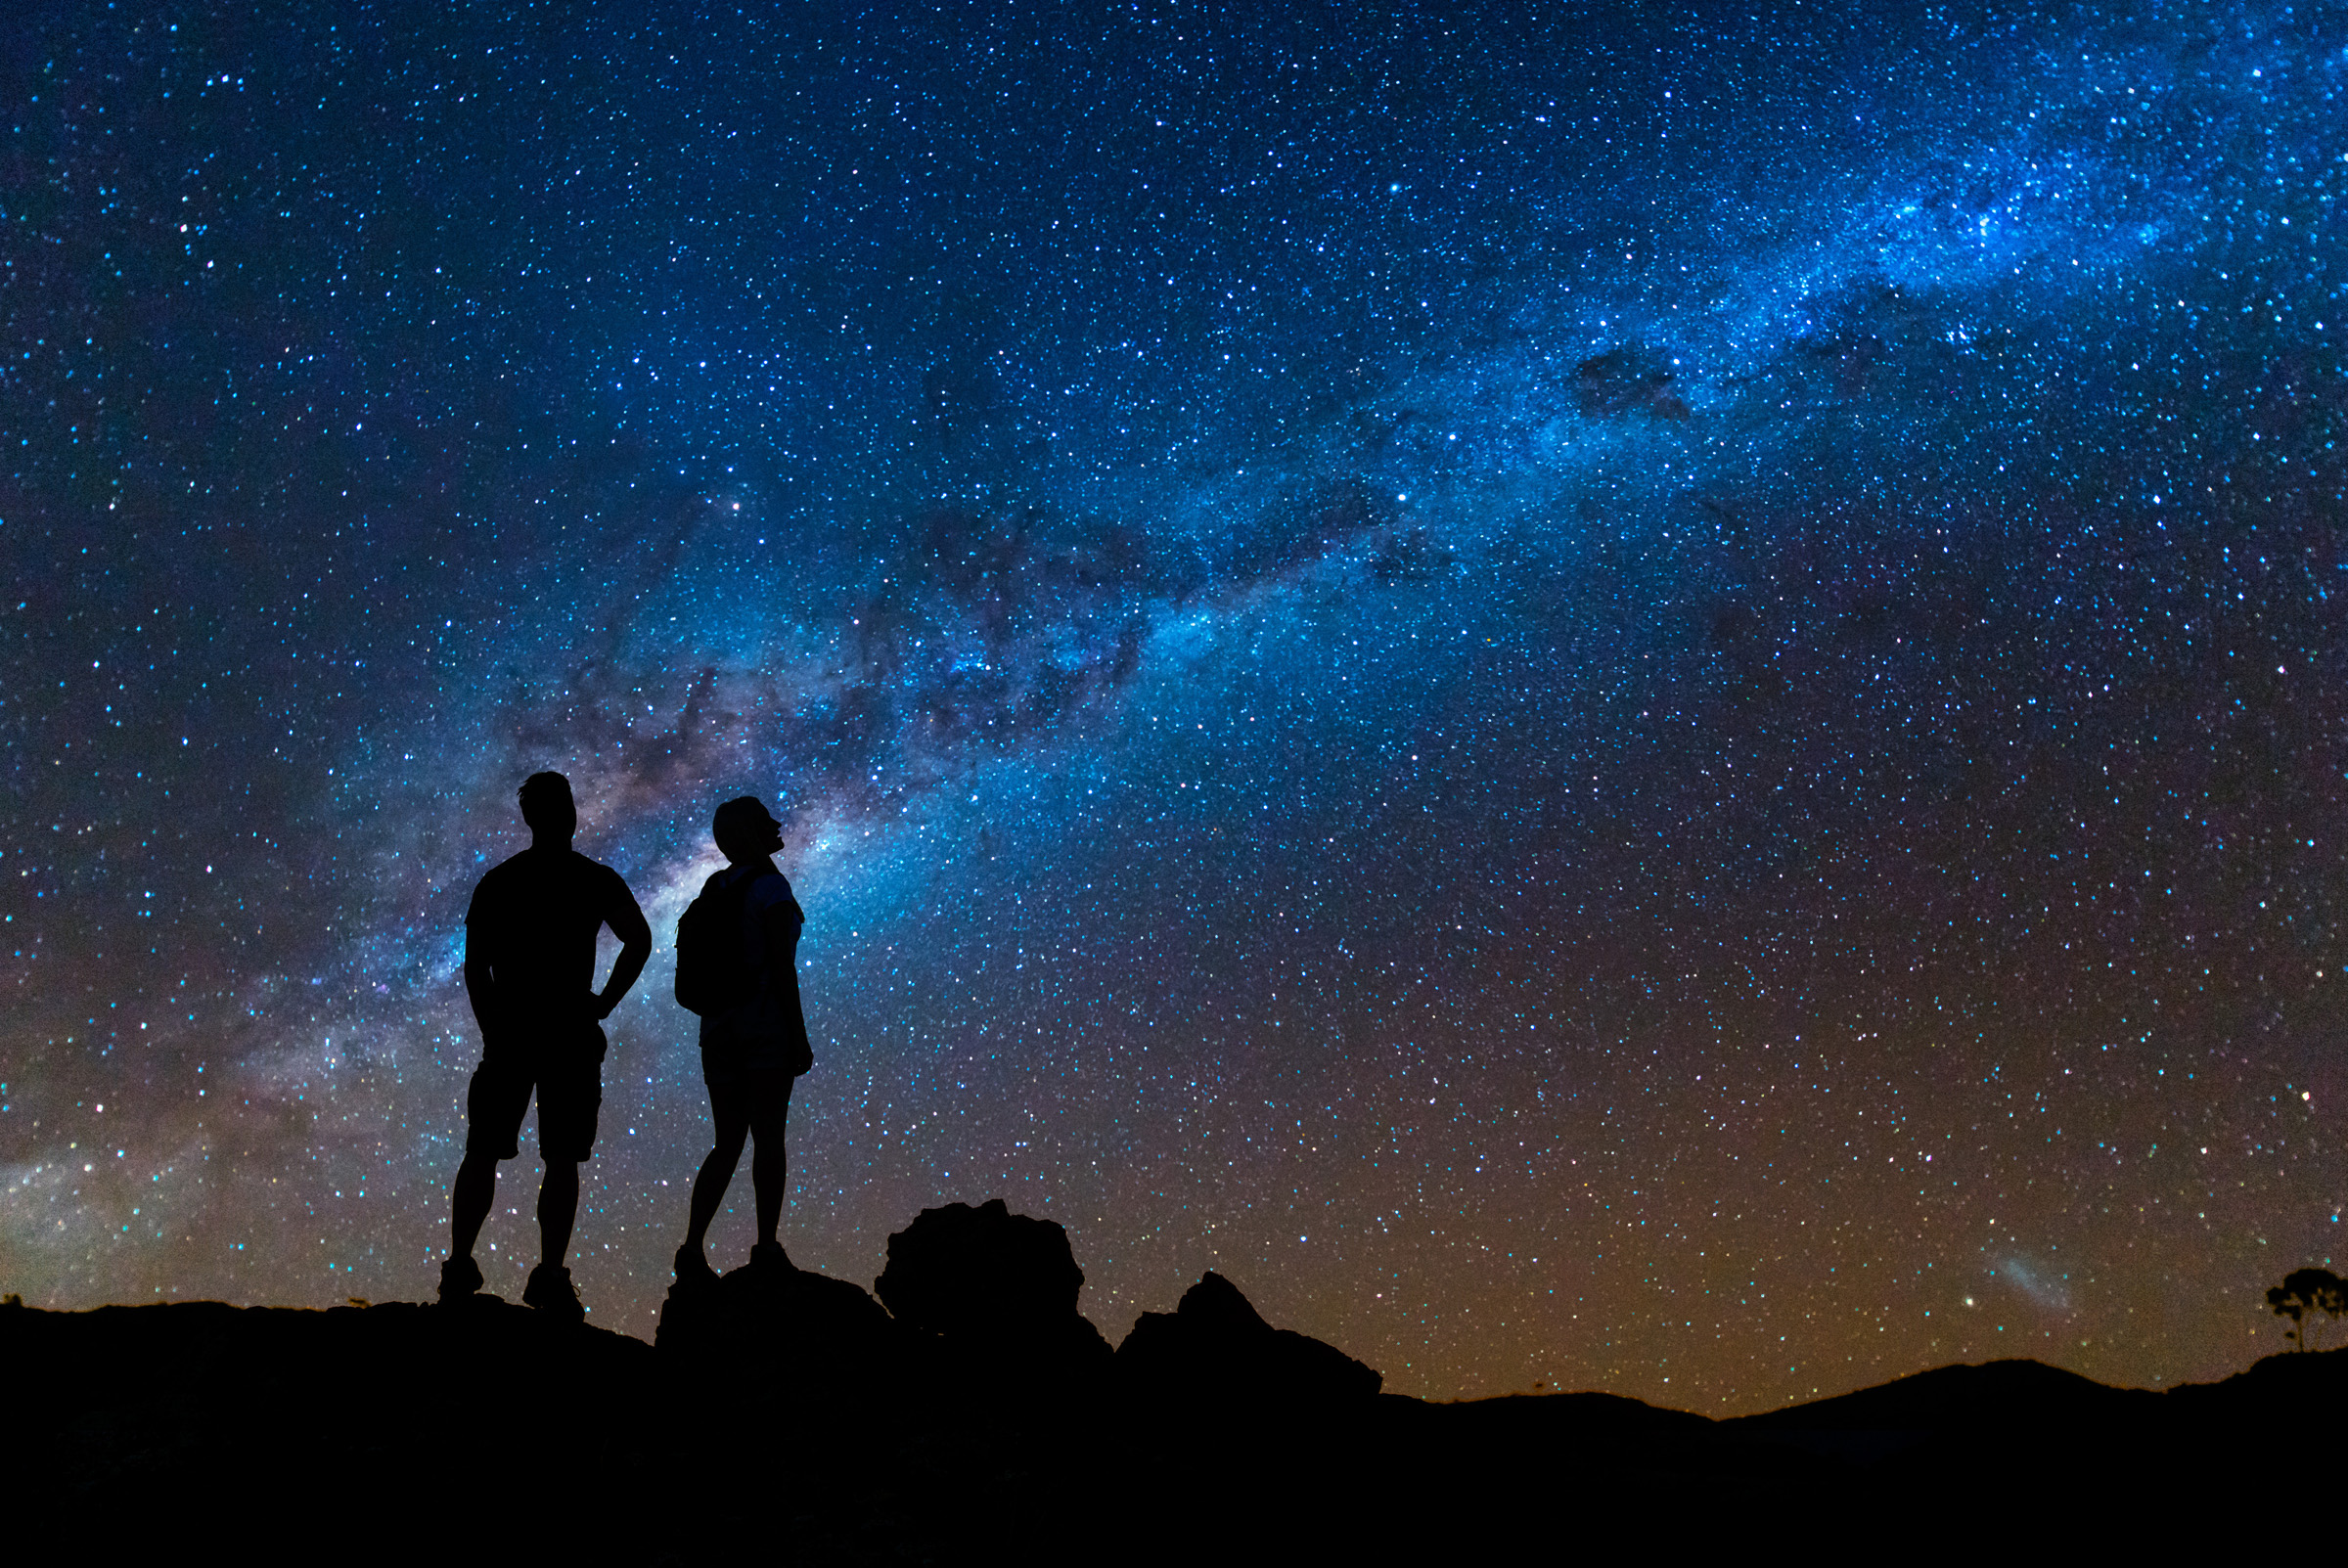 Arkaroola. PICTURE CREDIT: South Australian Tourism Commission